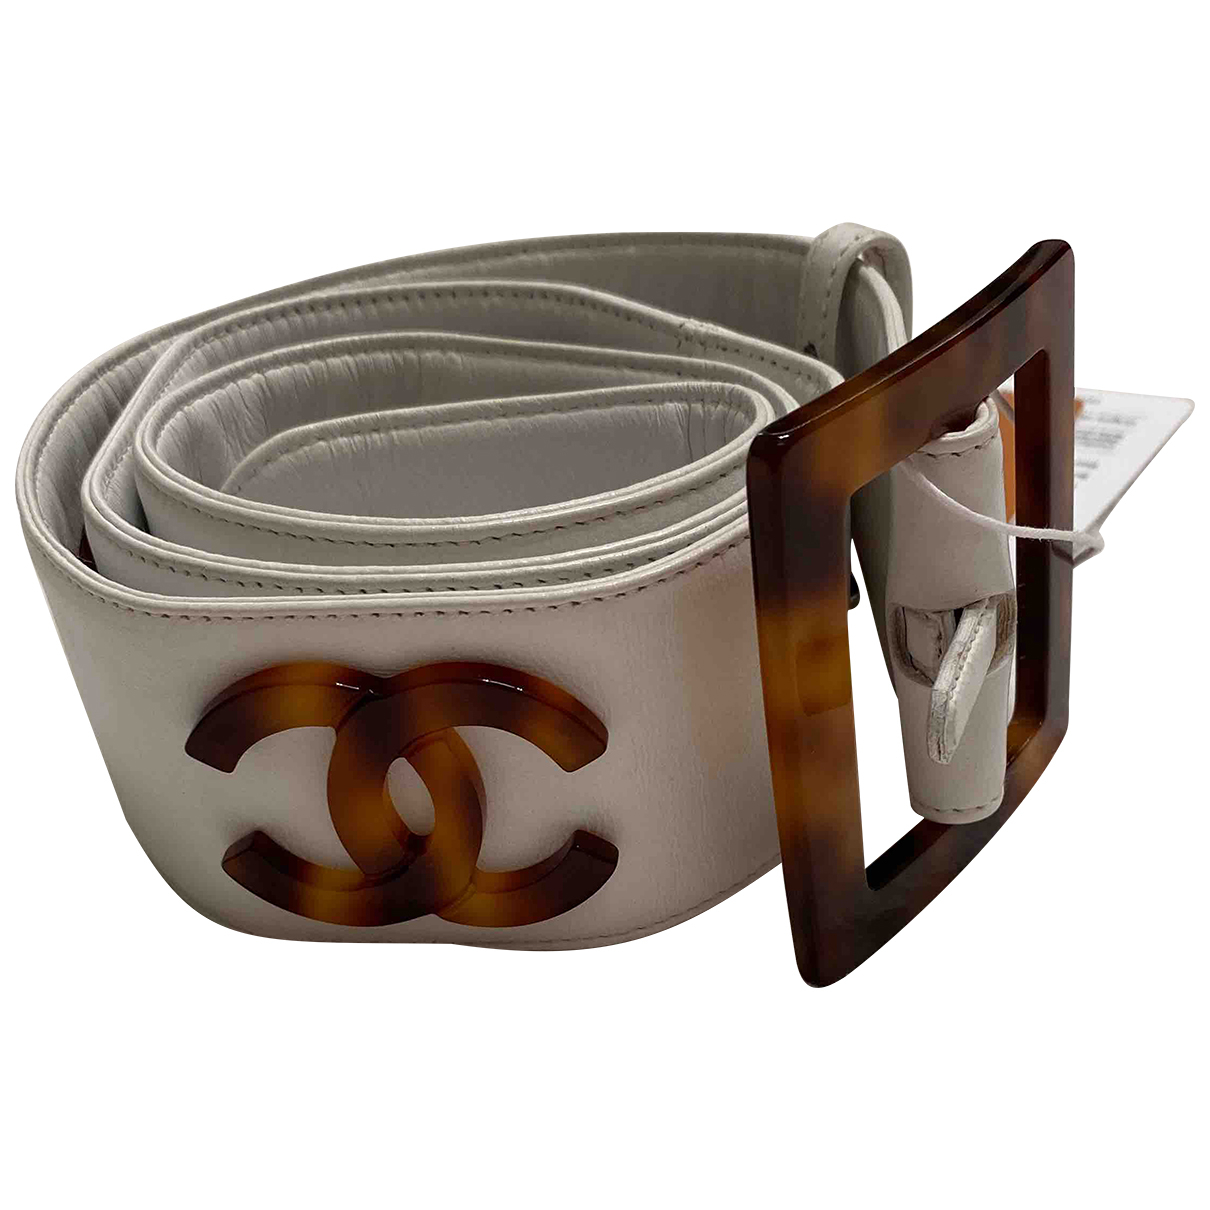 Chanel \N White Leather belt for Women 80 cm